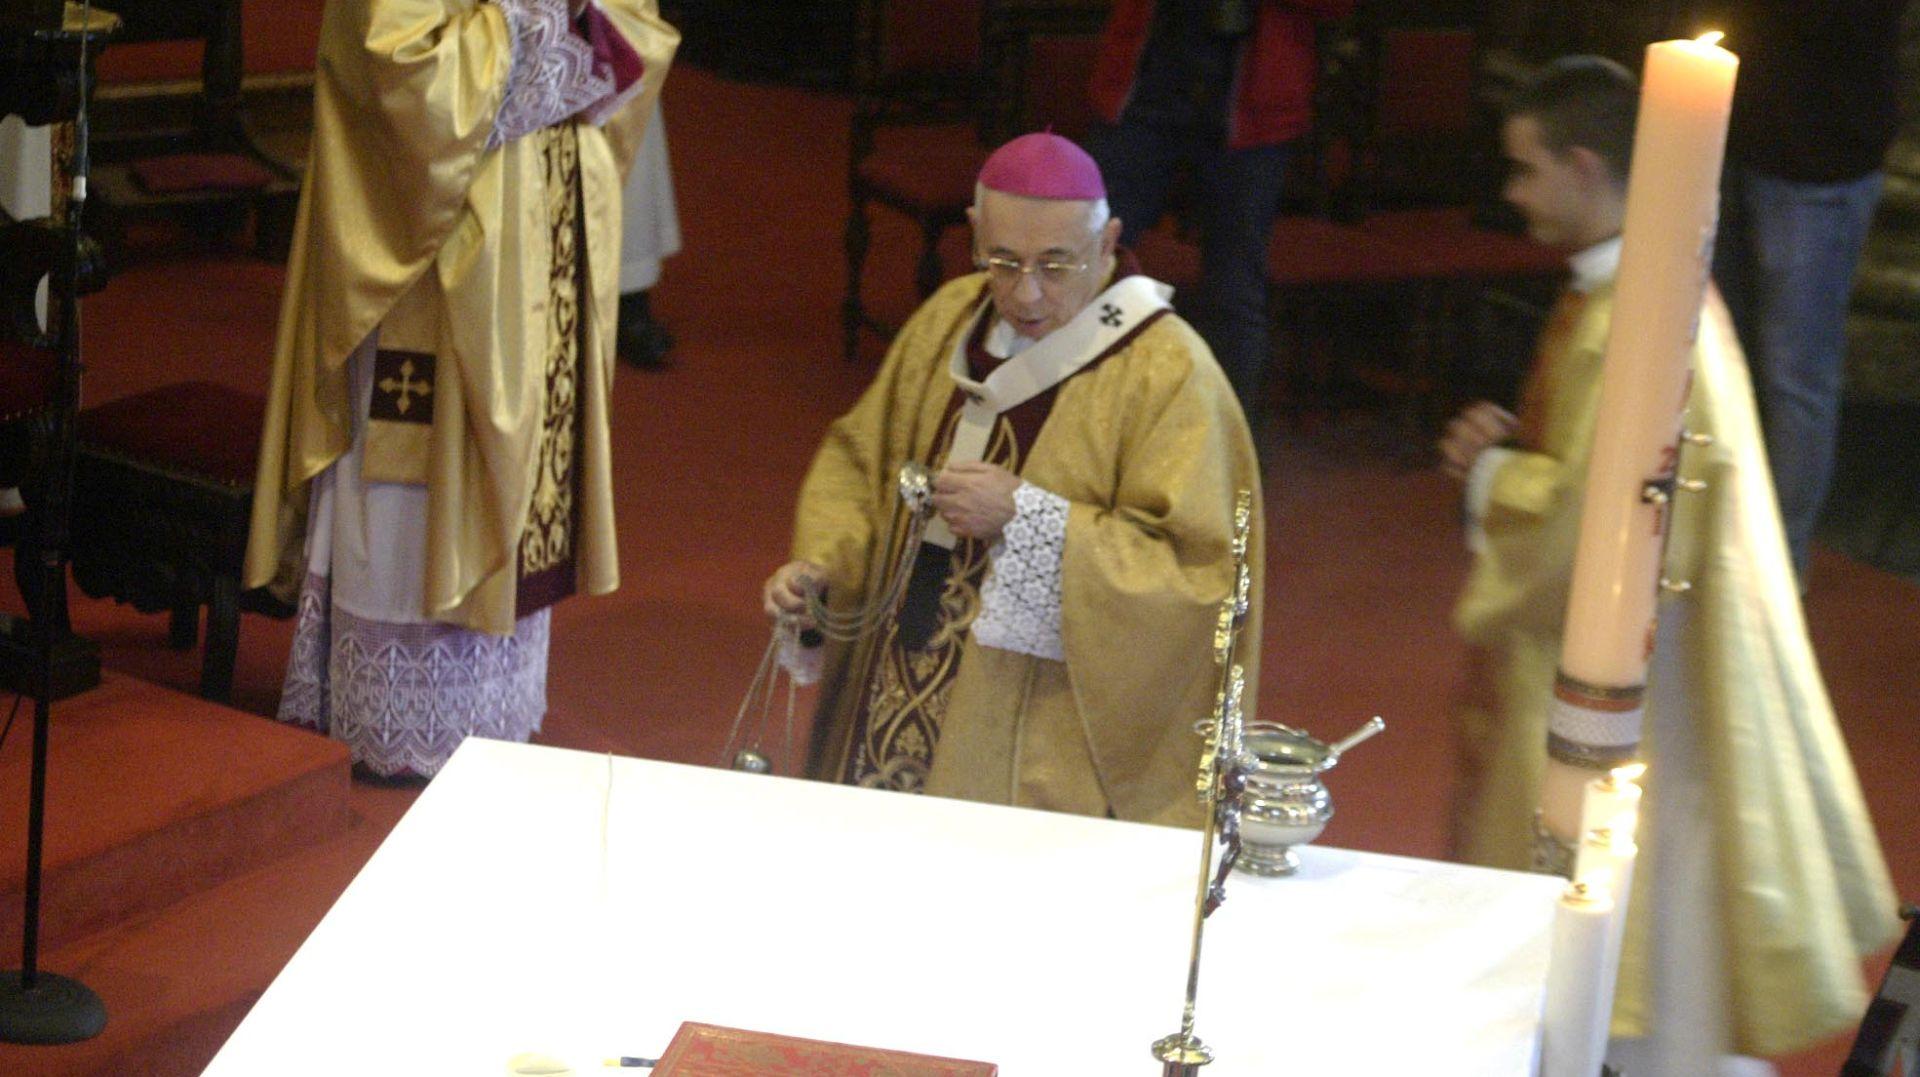 Nadbiskup Devčić pozvao na prevladavanje strahova današnjice